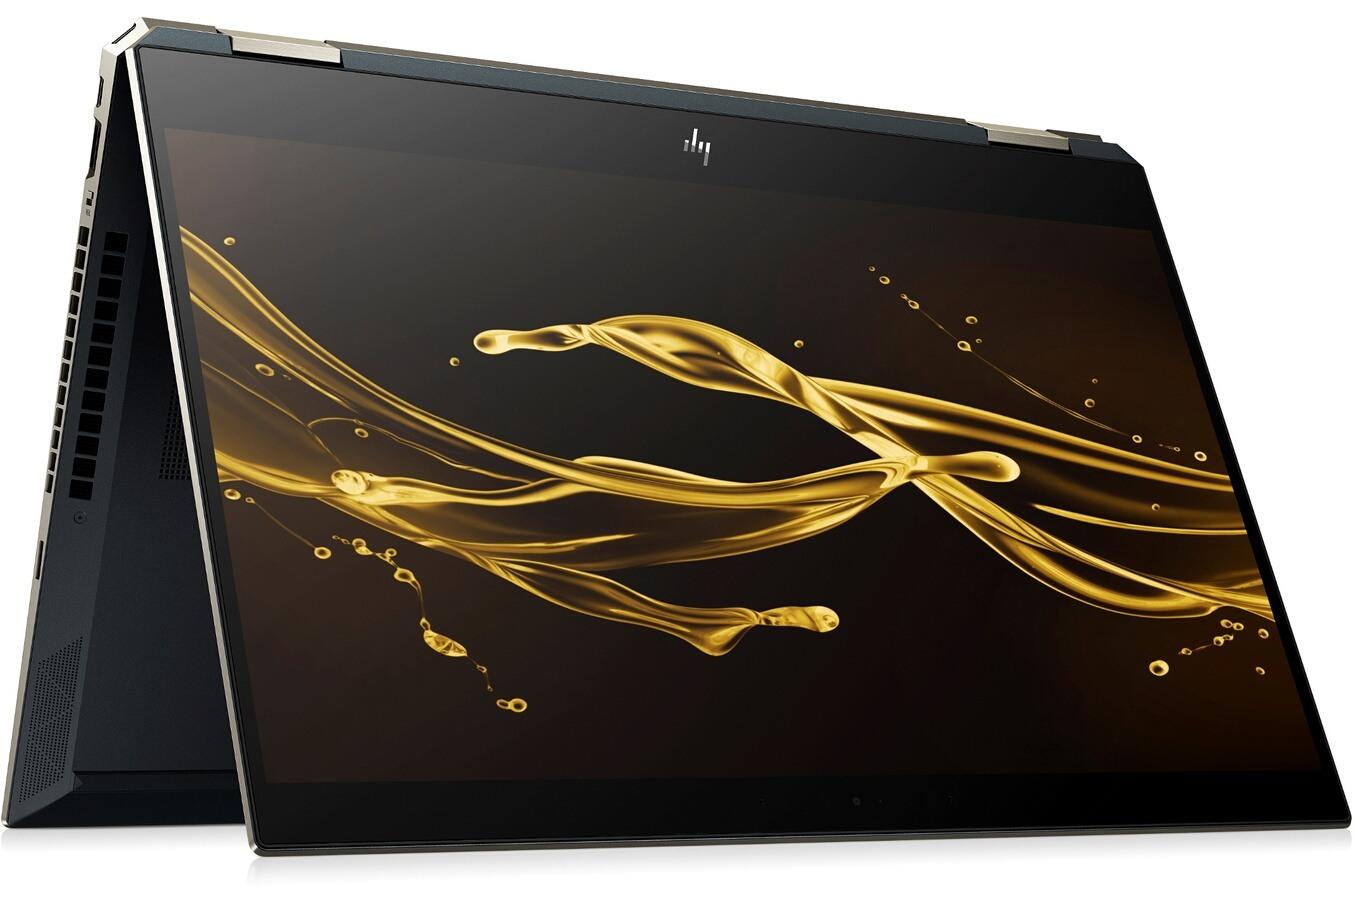 "HP Spectre x360 15-df0004nf, PC tablette 15"" 4K polyvalent (1699€)"